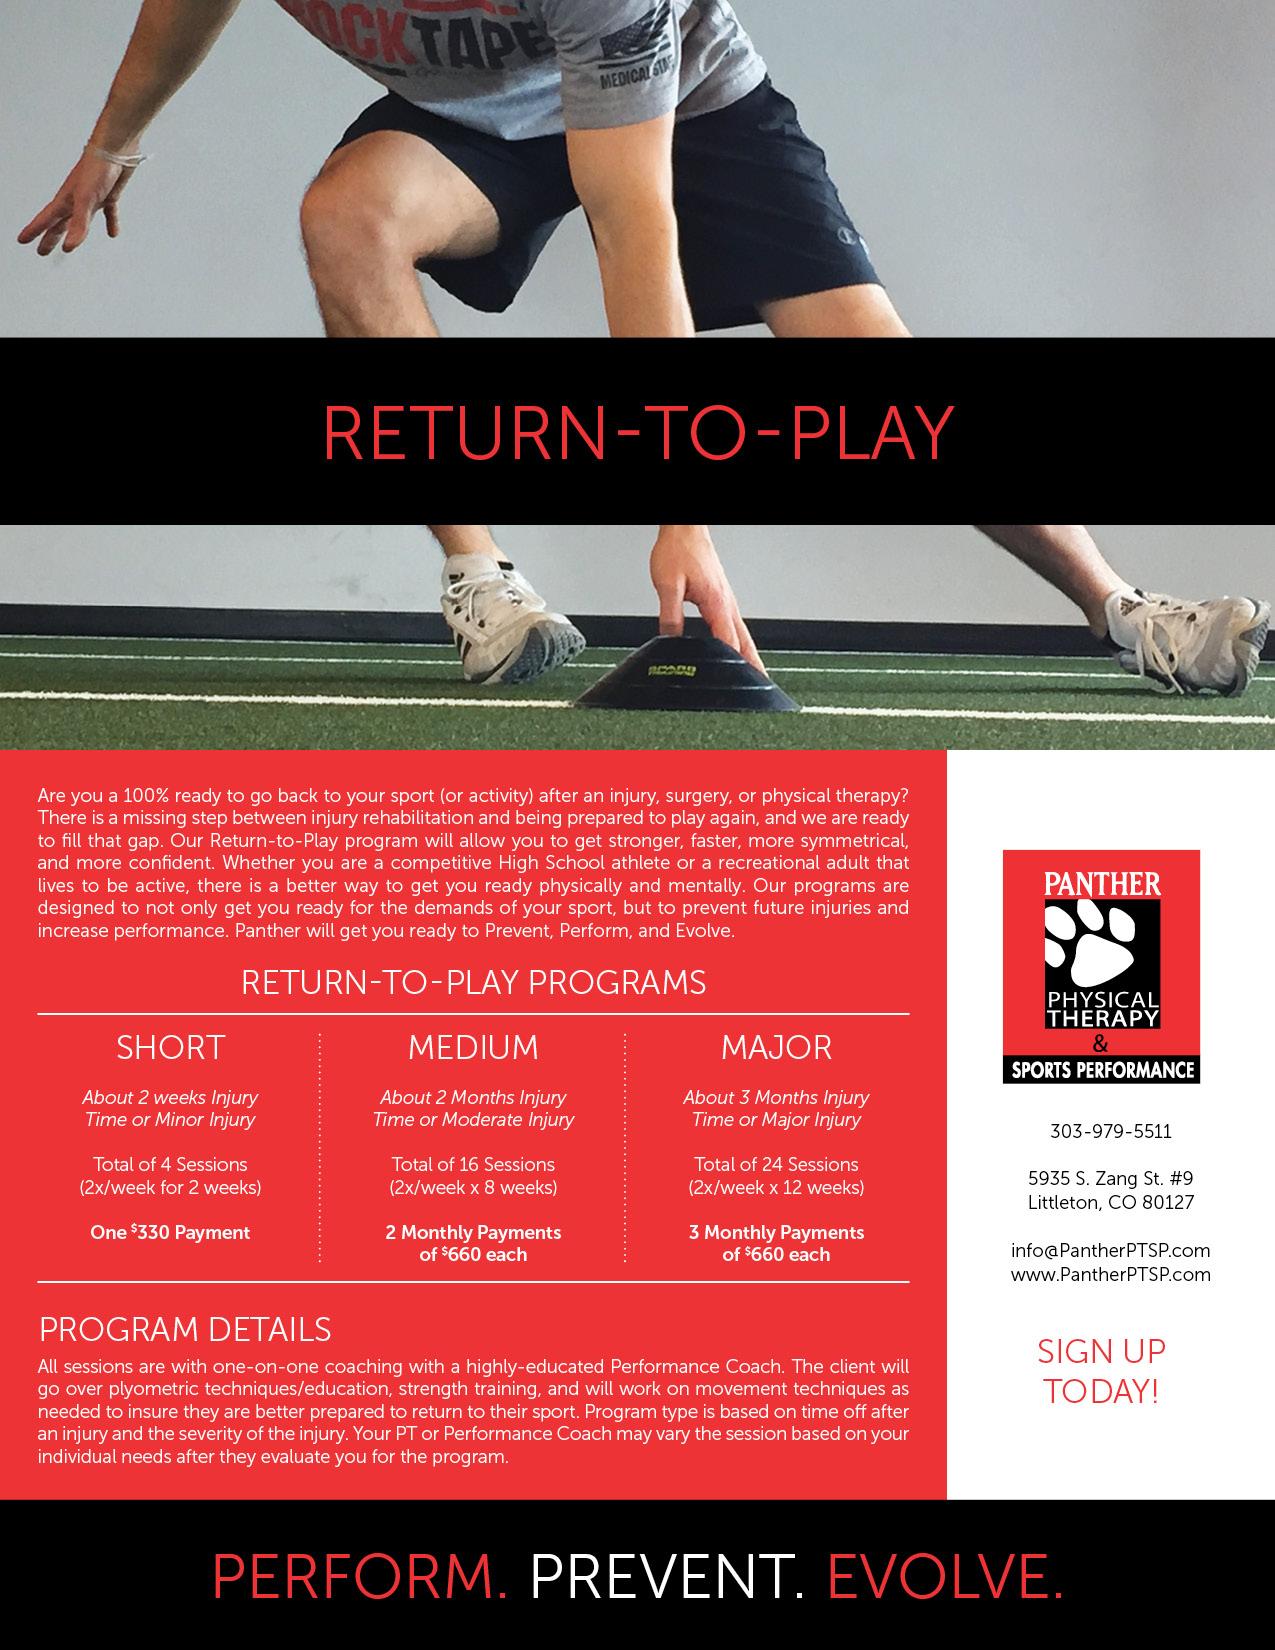 Return-to-Play Programs